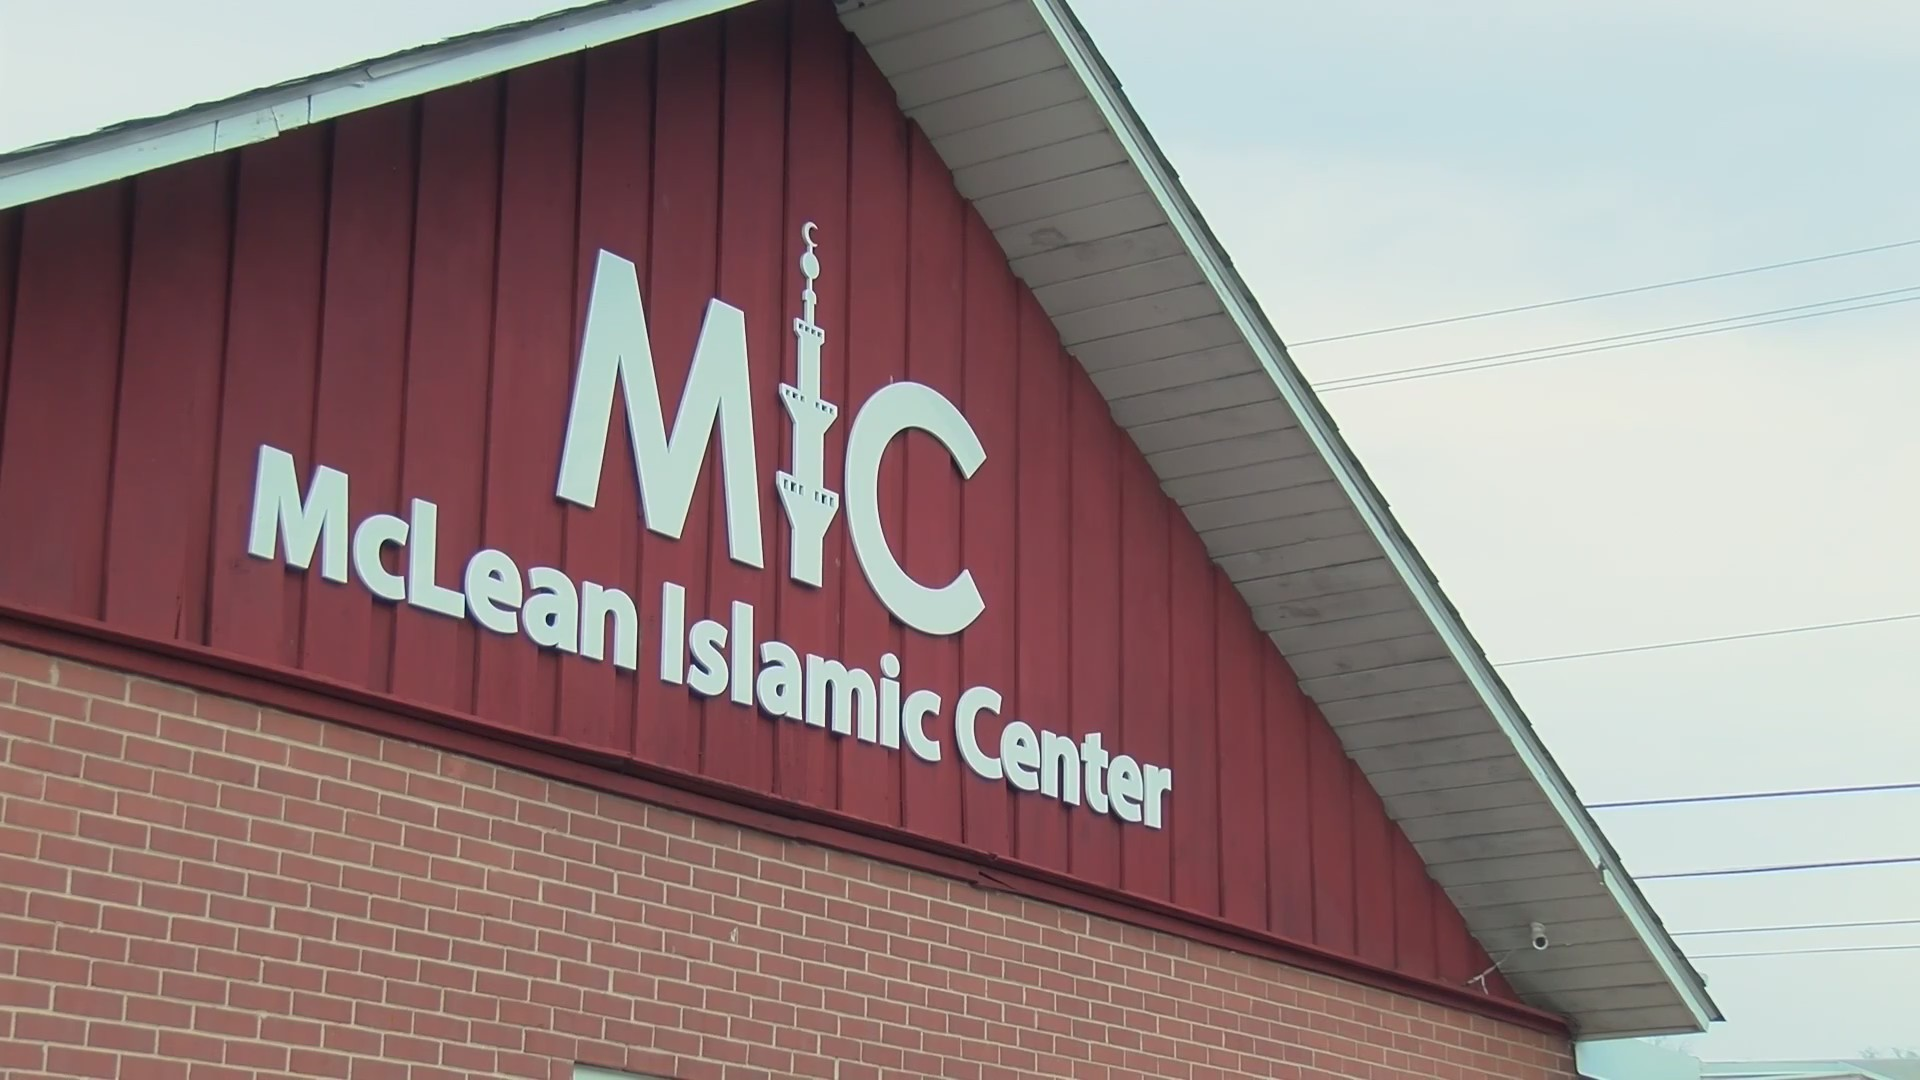 Mclean_Islamic_Center_0_20181213031219